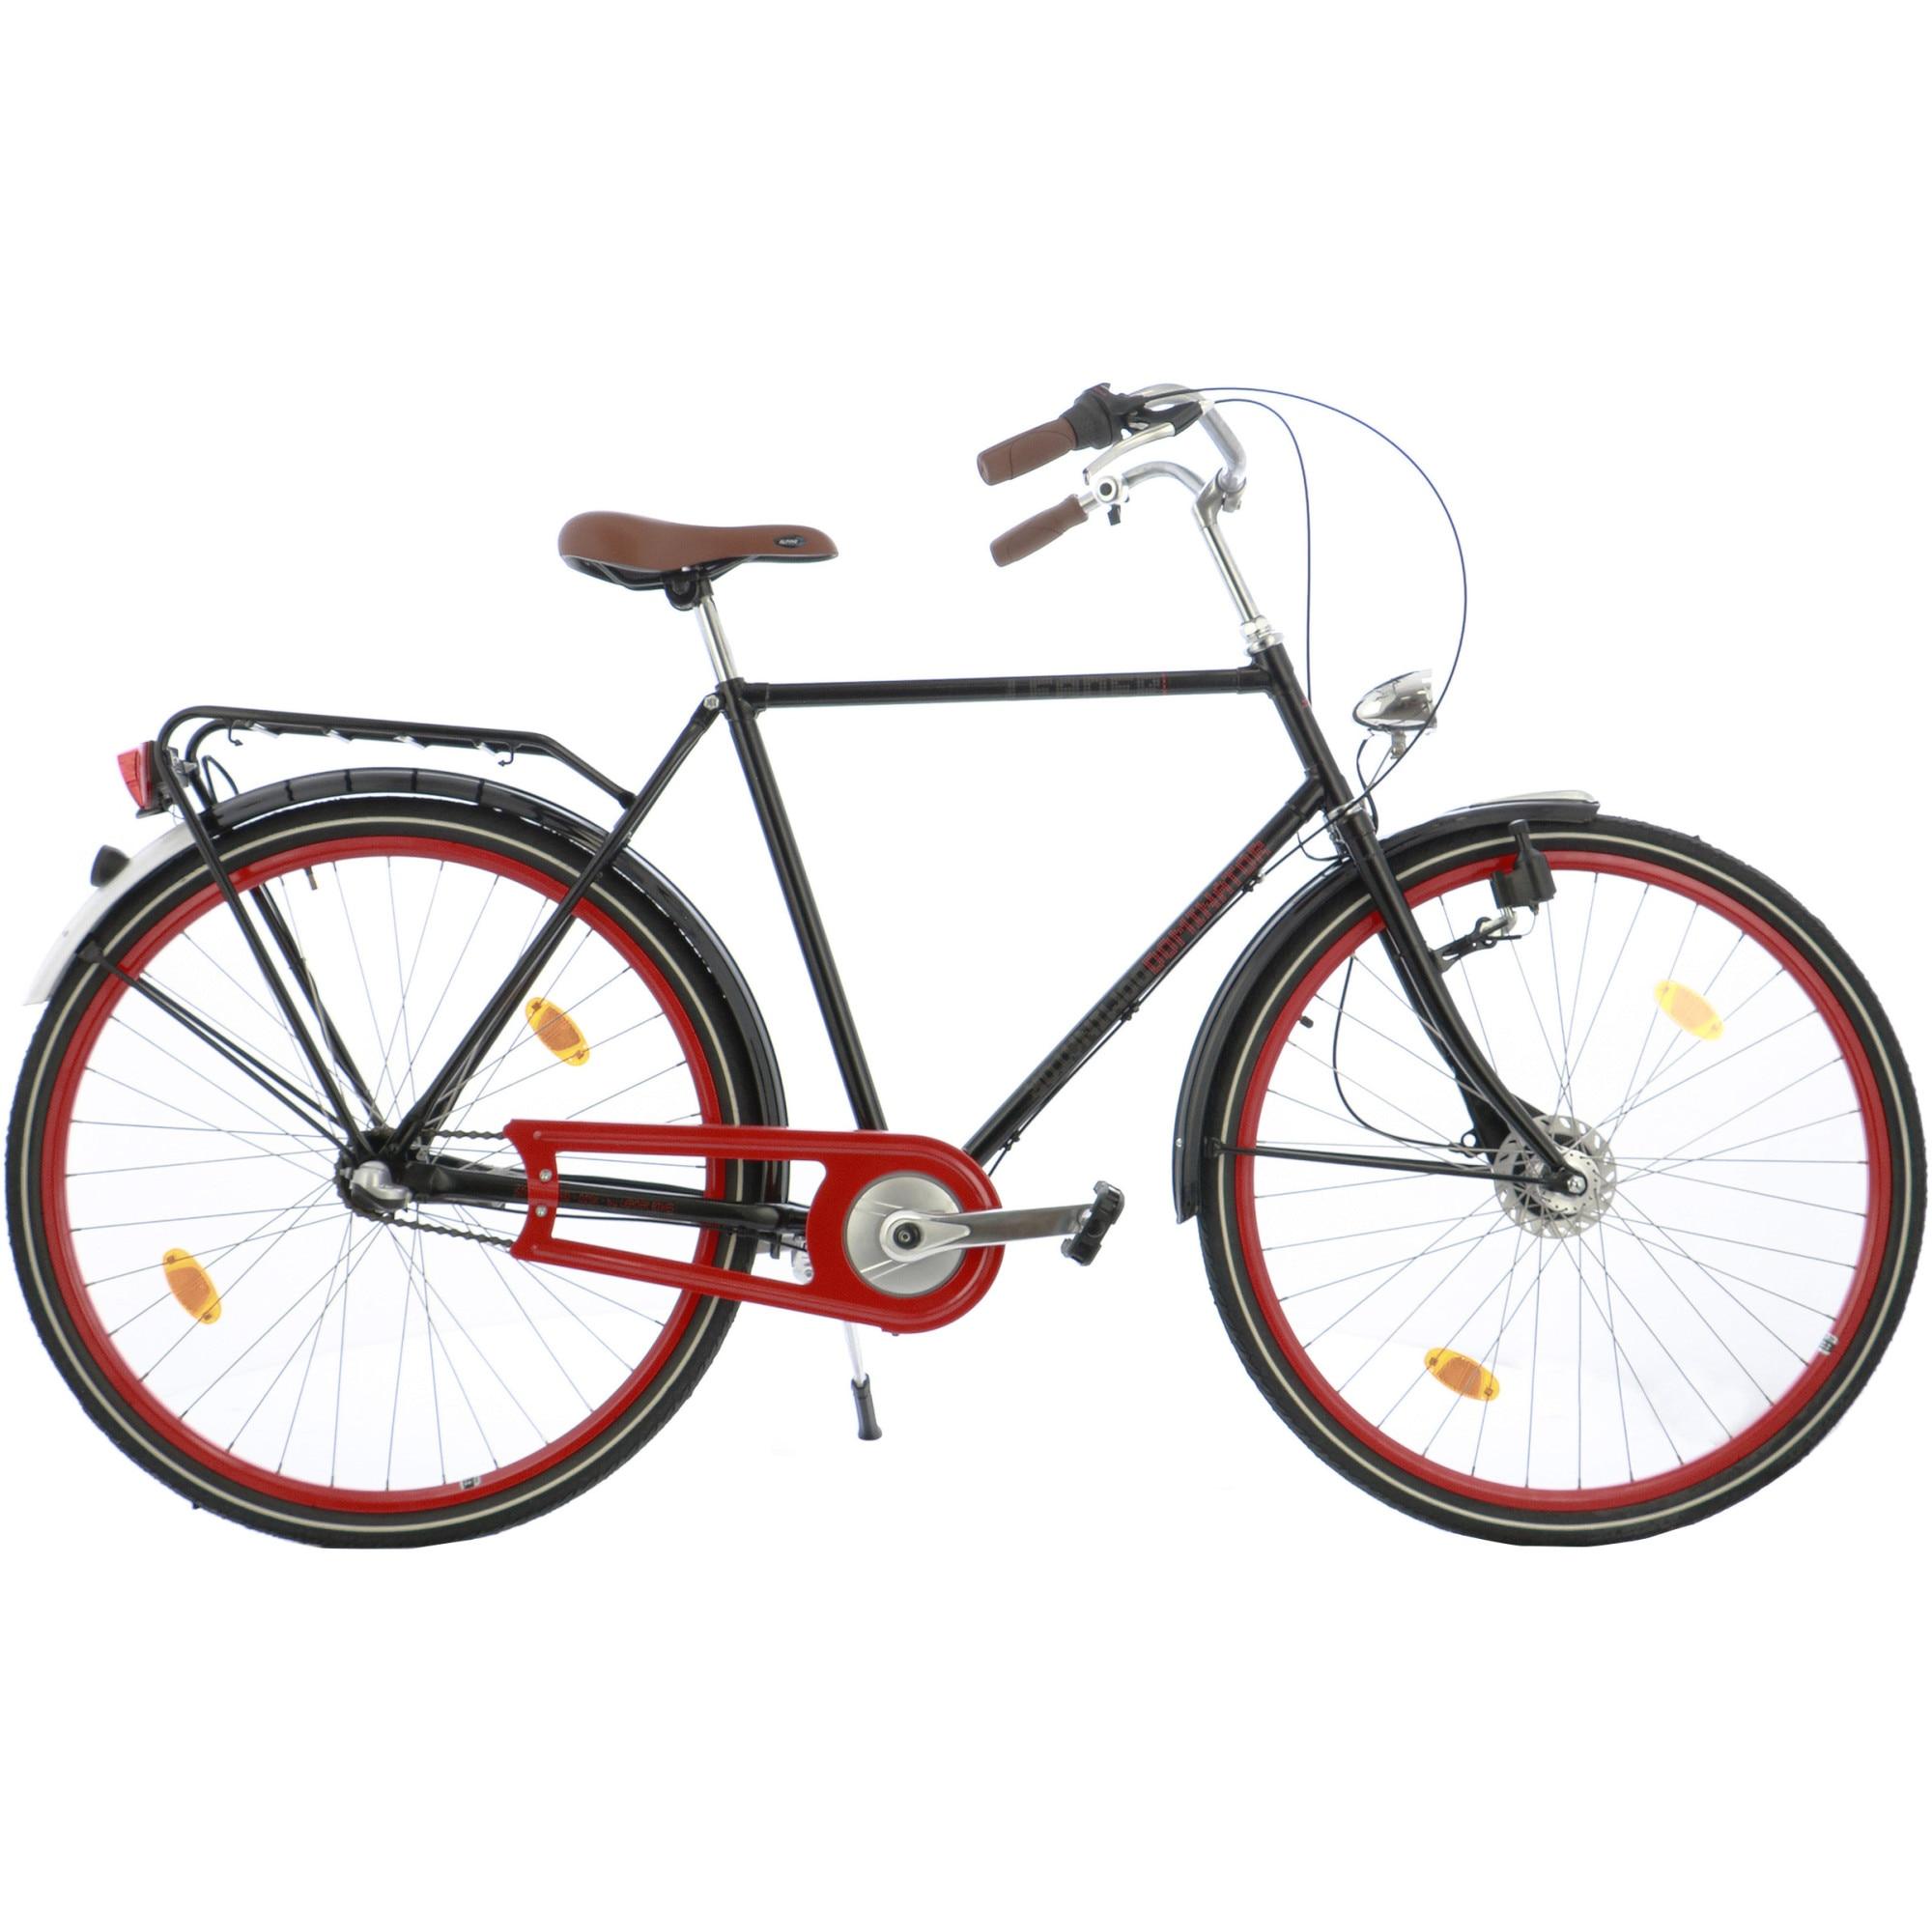 "Fotografie Bicicleta City 28"" Leader Leader Retro transmisie NX 3v, frana fata Shimano Nexus, cadru 55cm, Black"